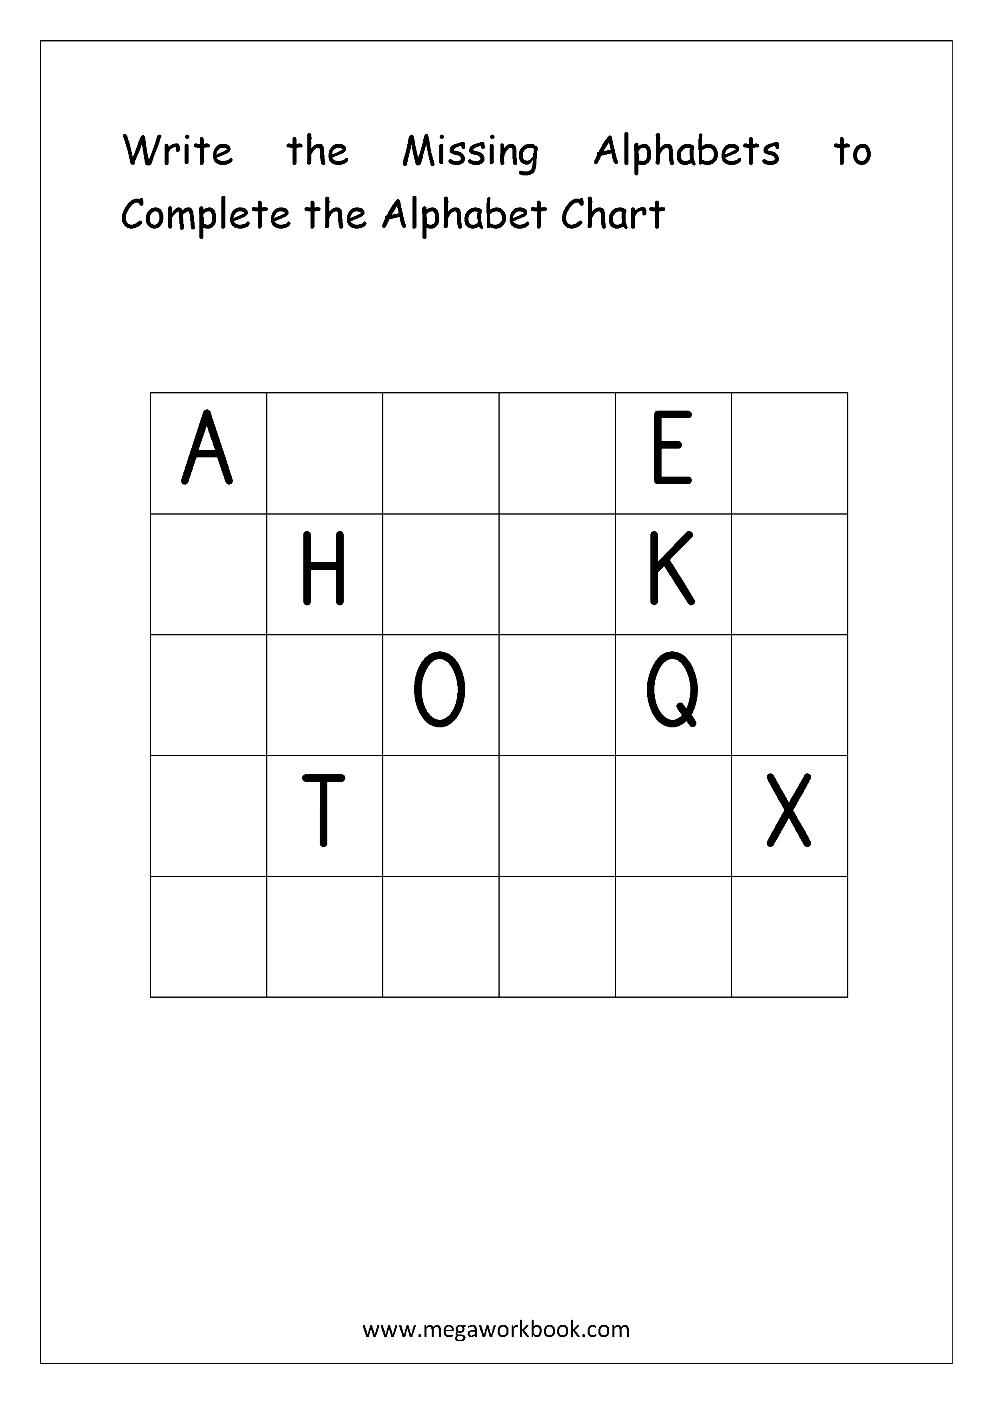 Free English Worksheets - Alphabetical Sequence with regard to Alphabet Sequencing Worksheets For Kindergarten